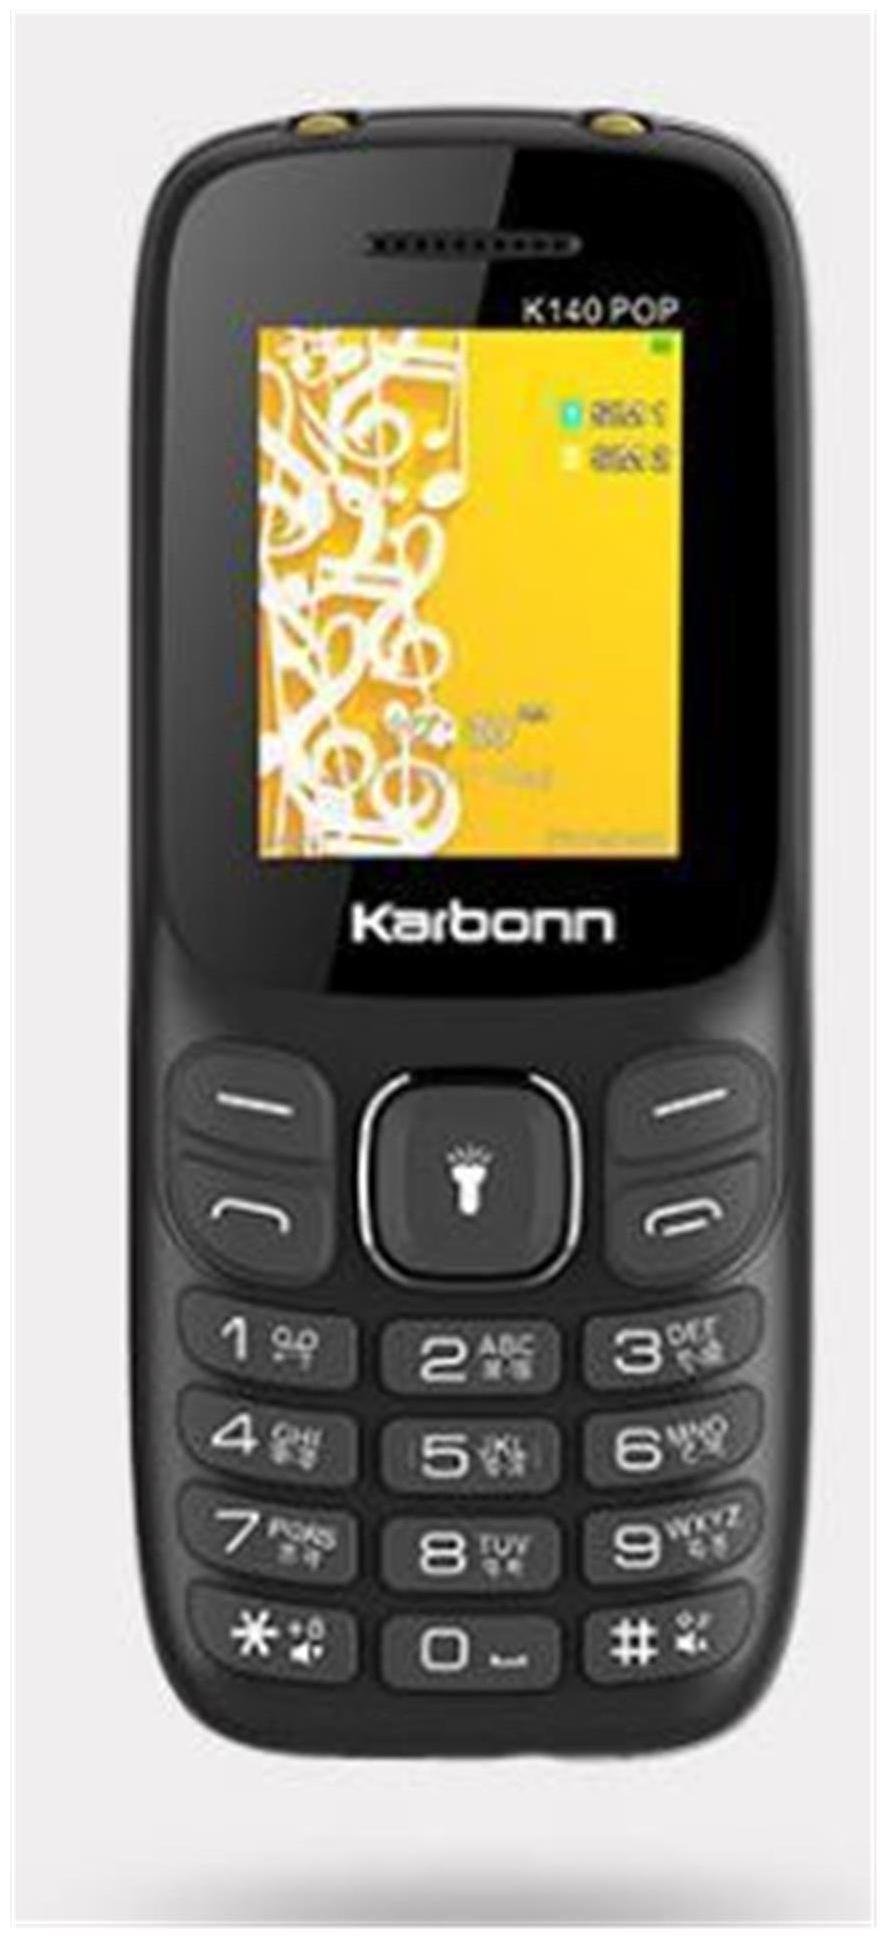 Karbonn K140 With Wireless FM (Black-Red)